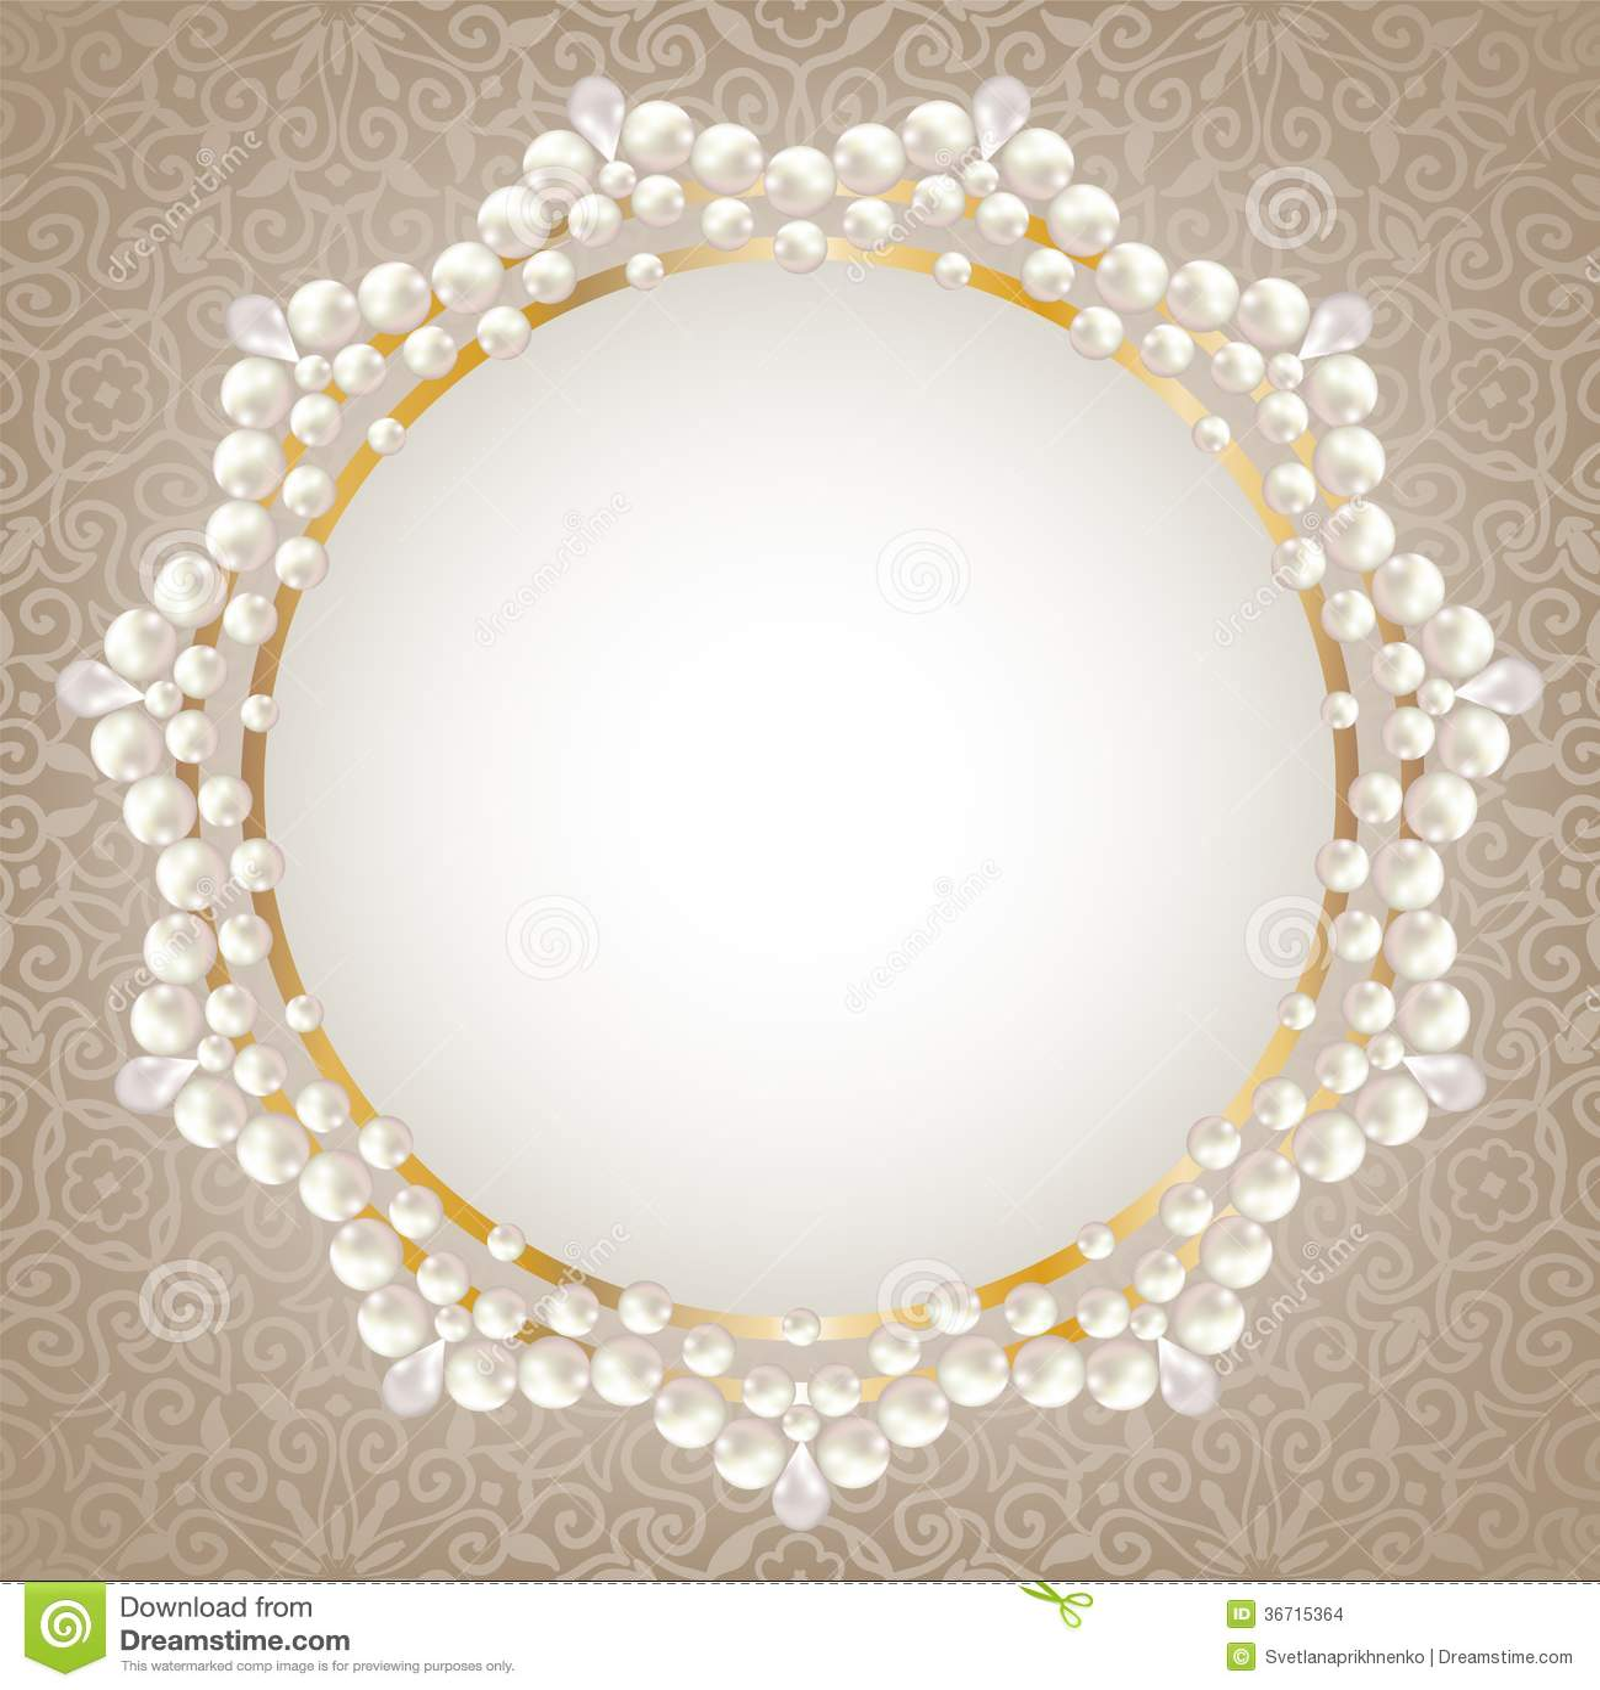 Pearl frame stock vector. Illustration of design, pattern - 36715364